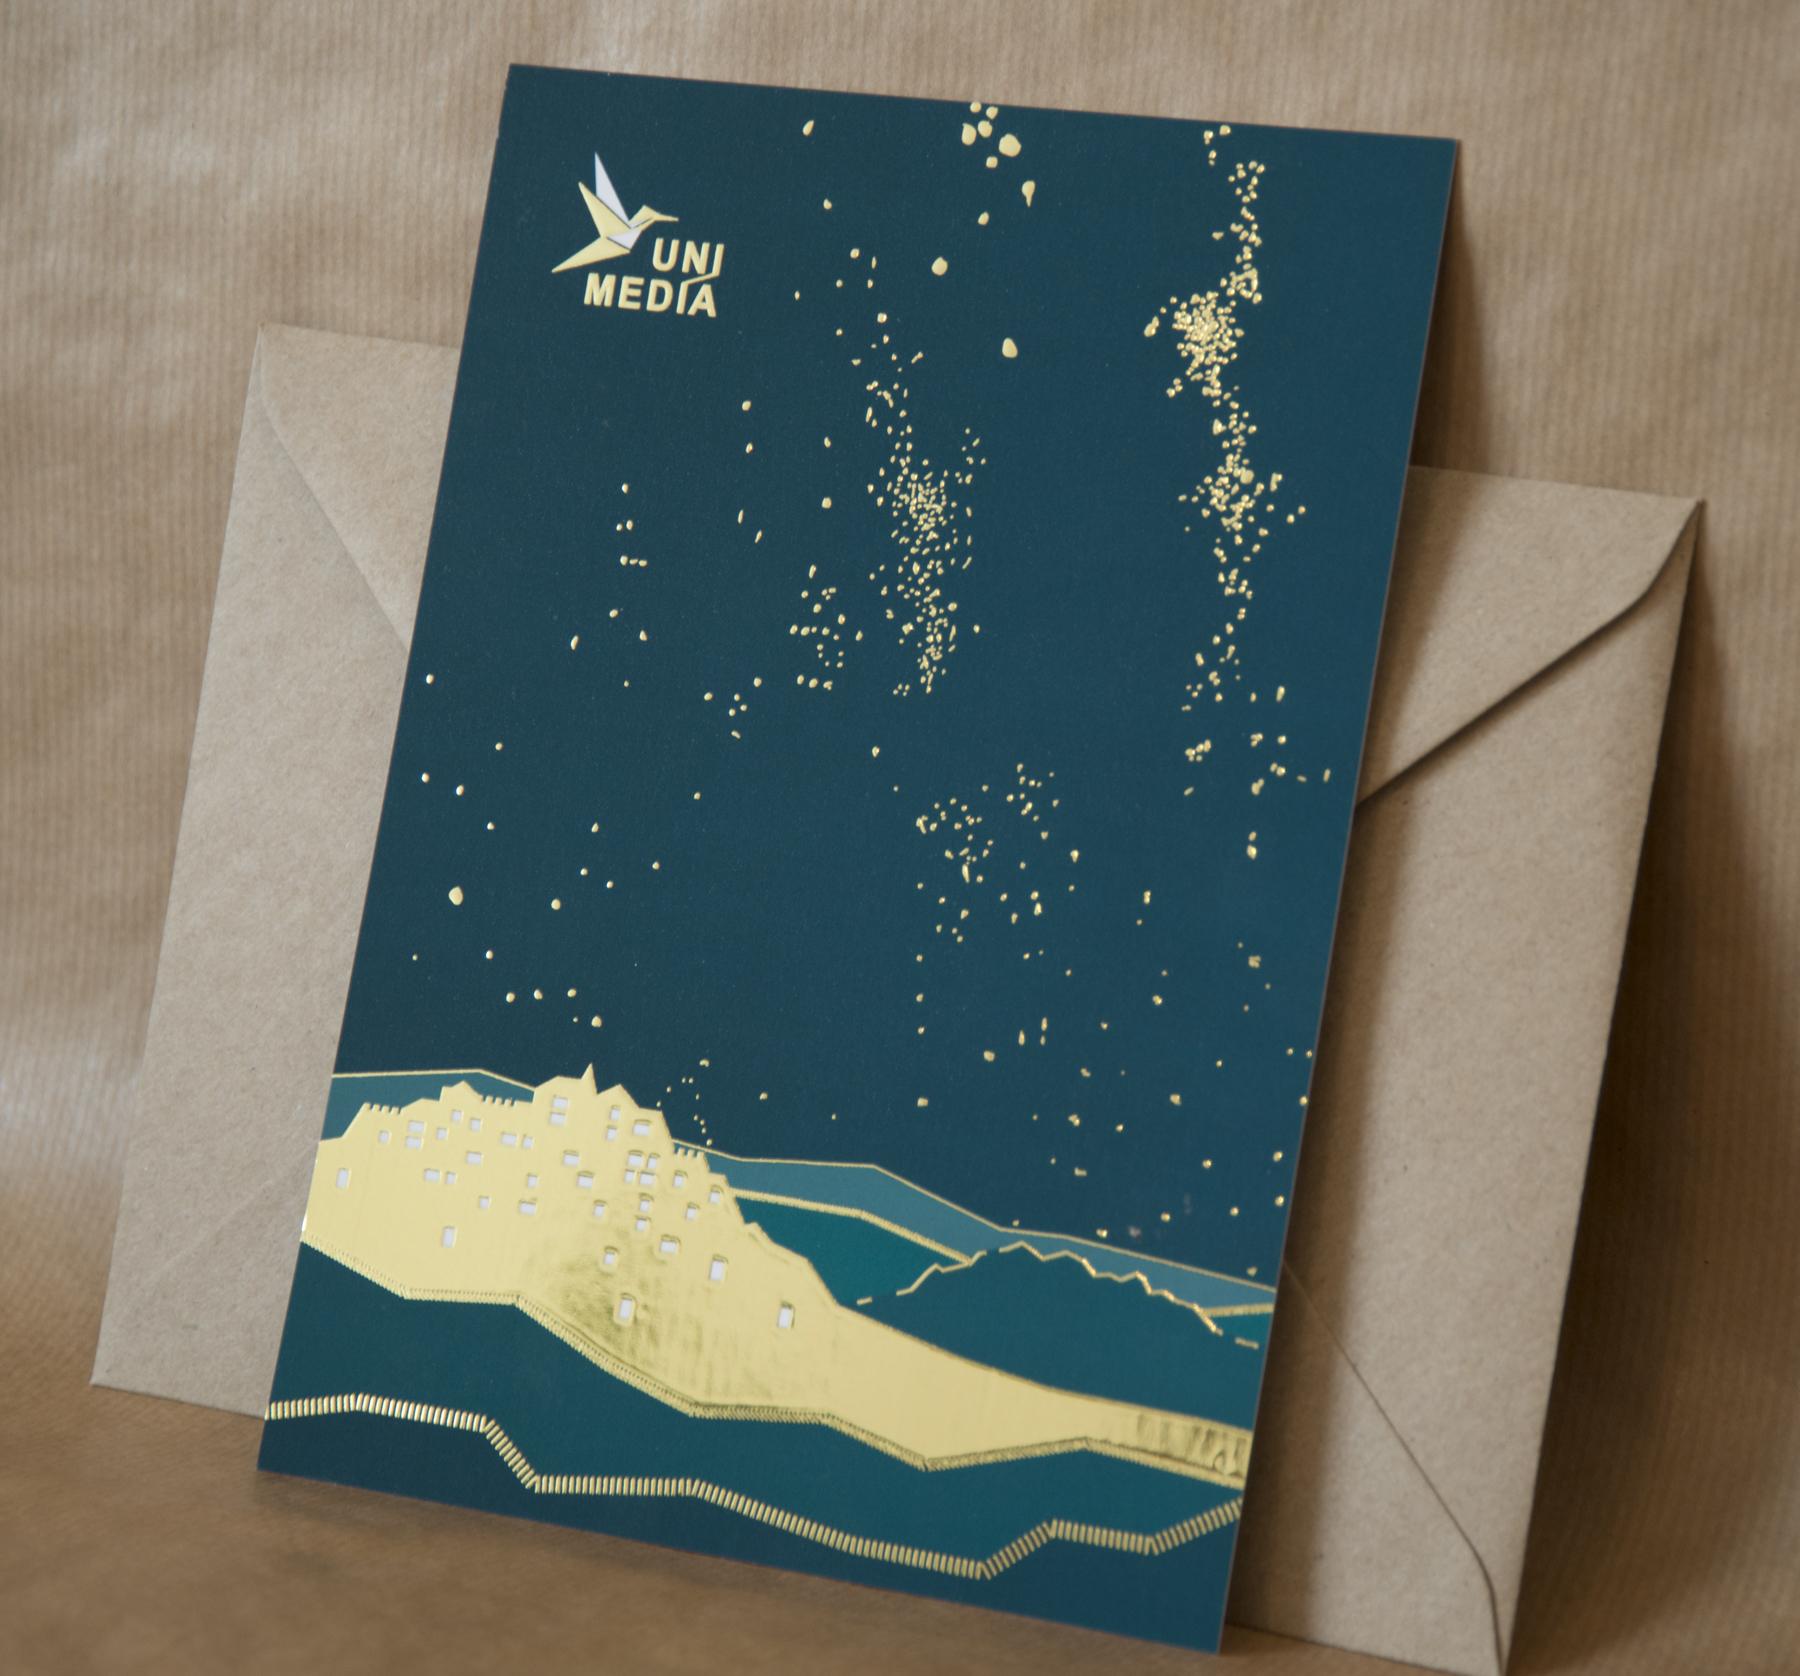 hortense-rossignol-graphisme-angers-carton-unimedia-3